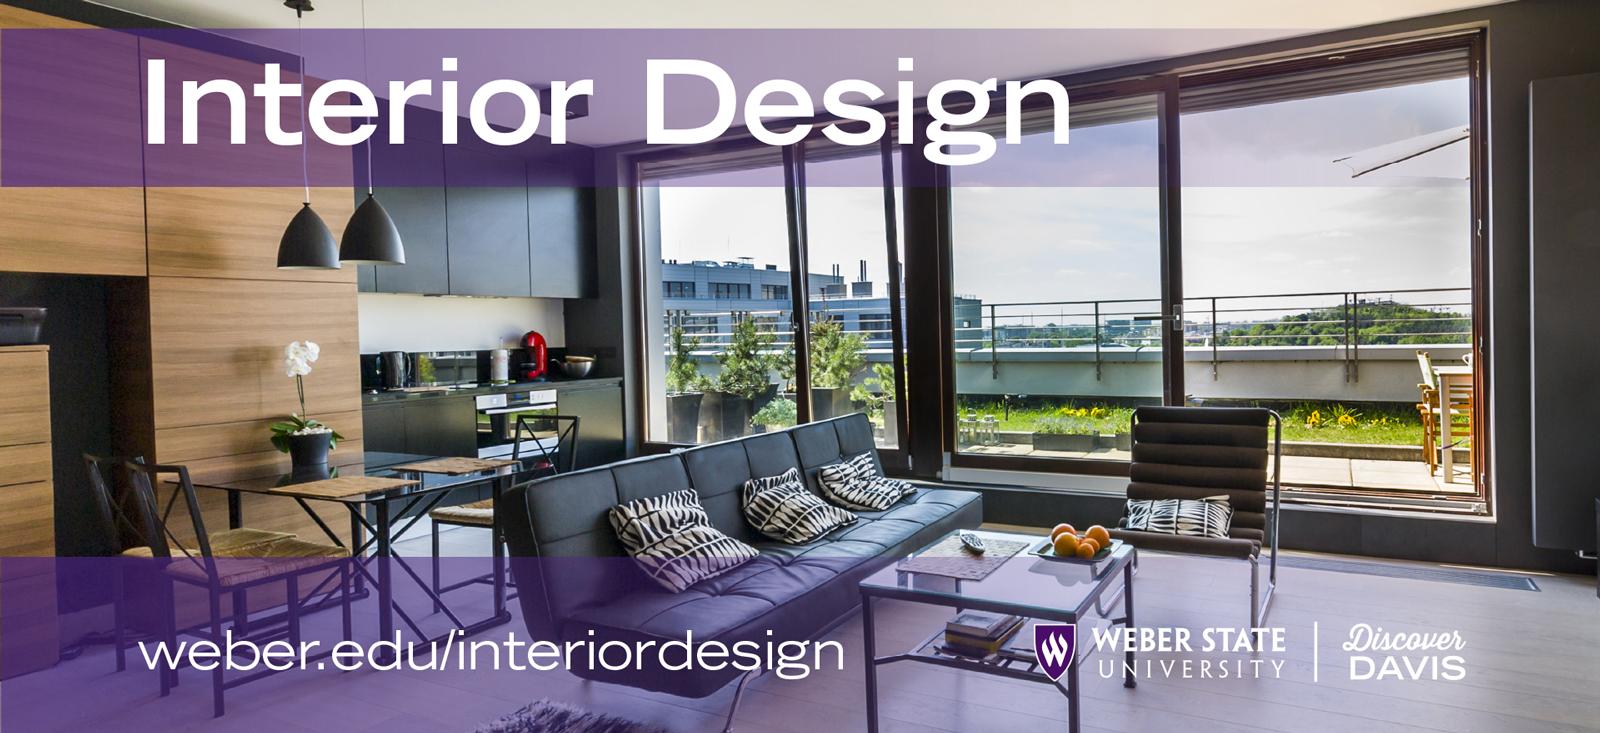 online interior design associate degree davis campus weber state university